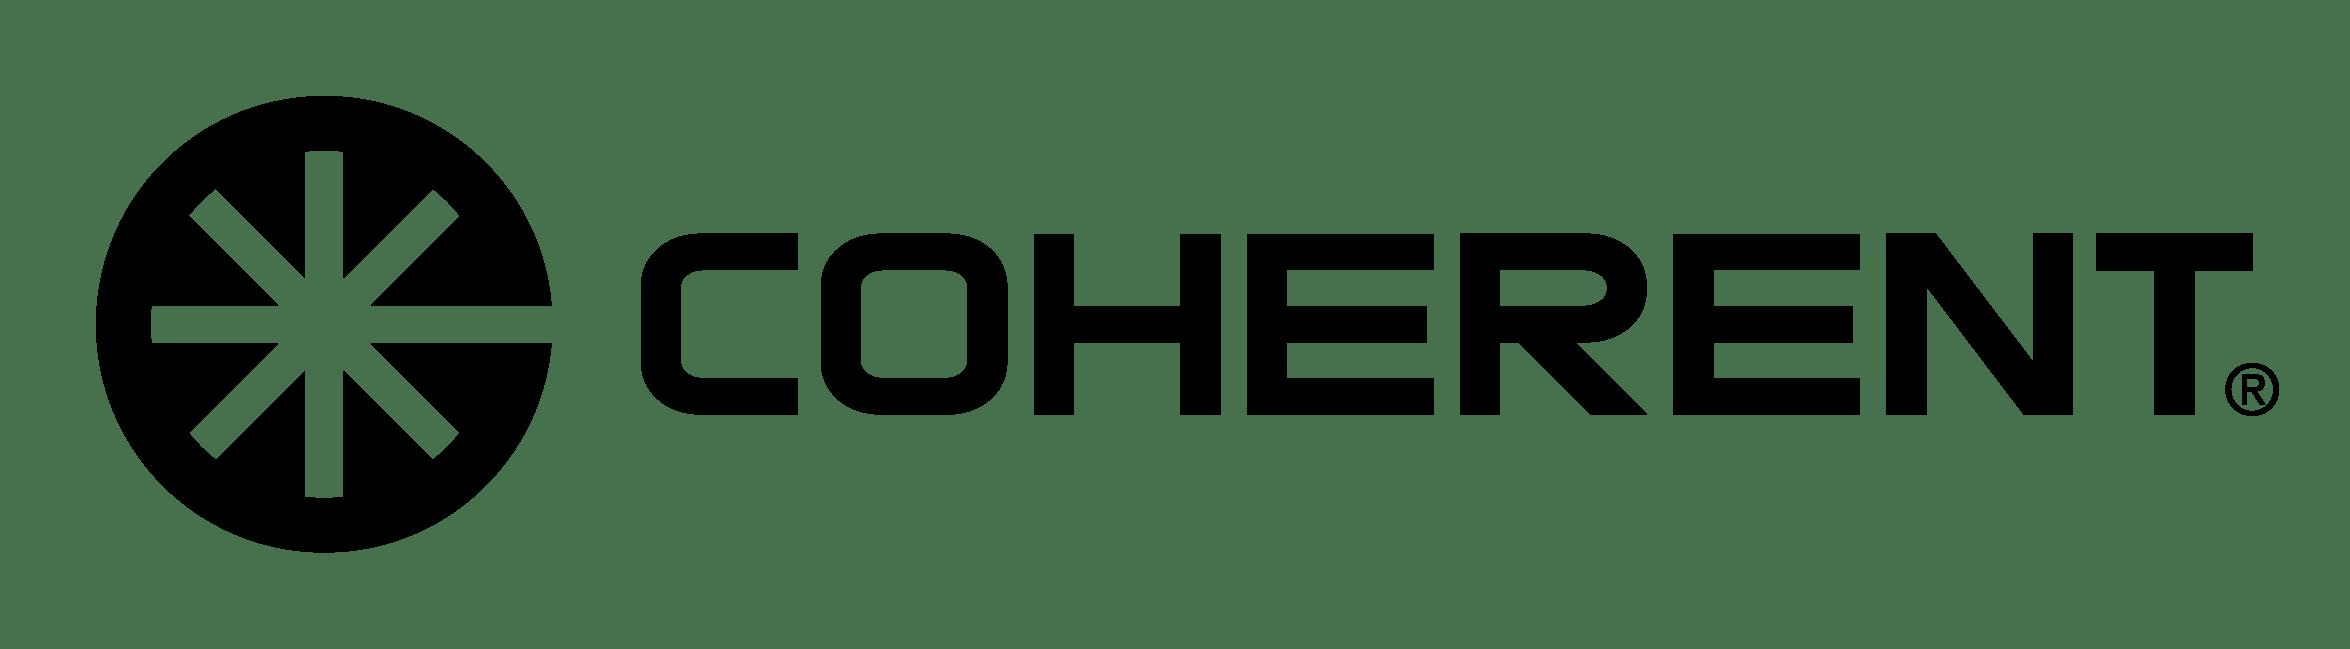 Coherent: Industrial lasers for laser welding, laser cutting, laser marking, etc.